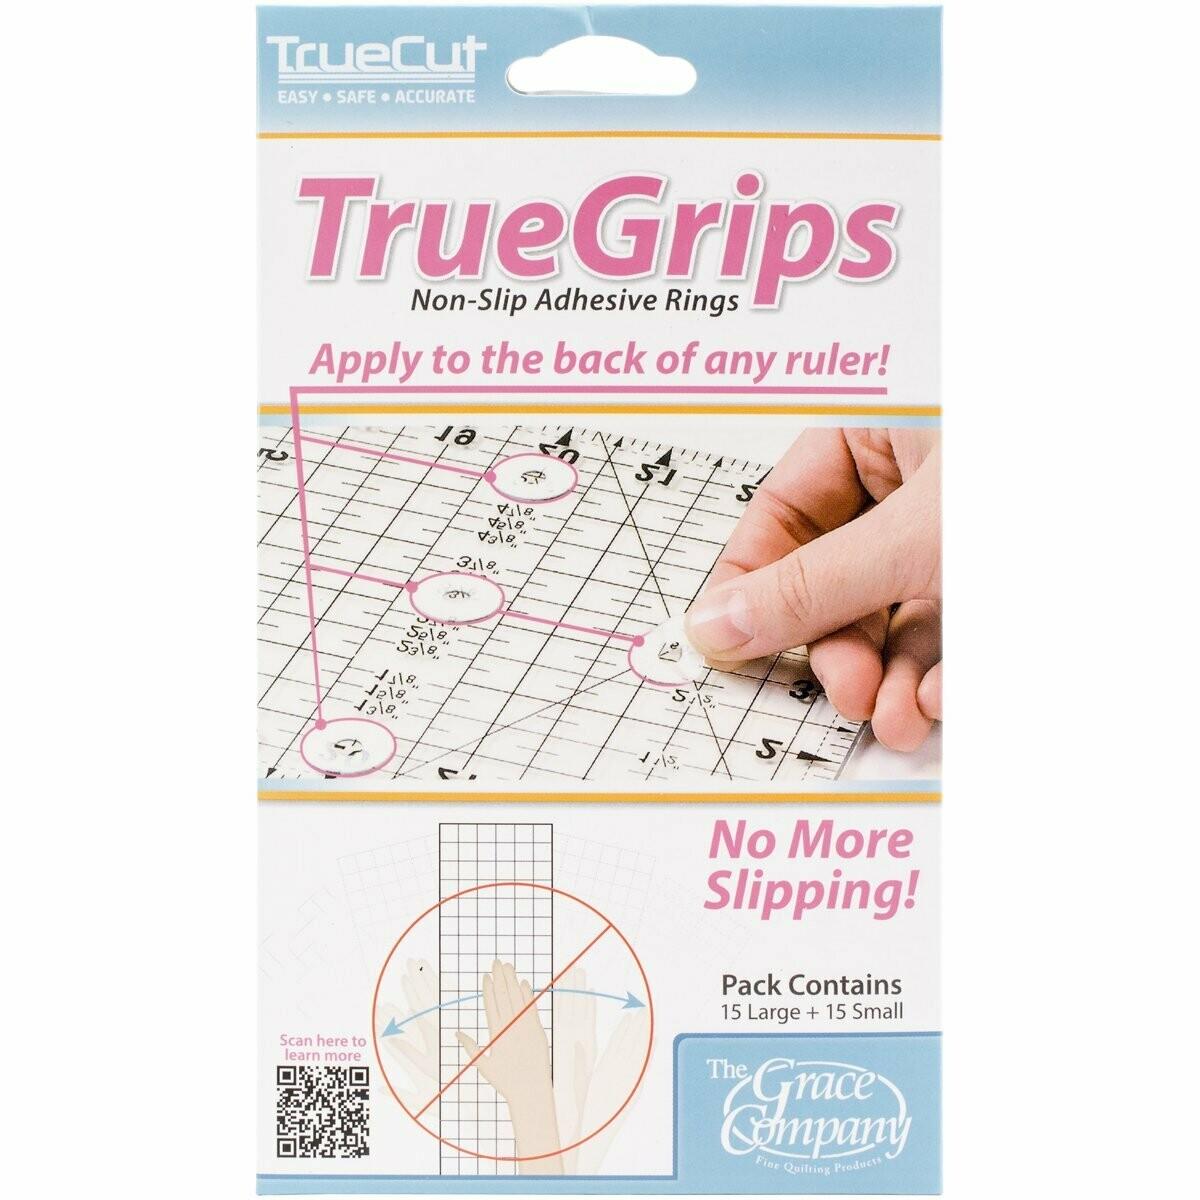 TRUE GRIPS | The Grace Company